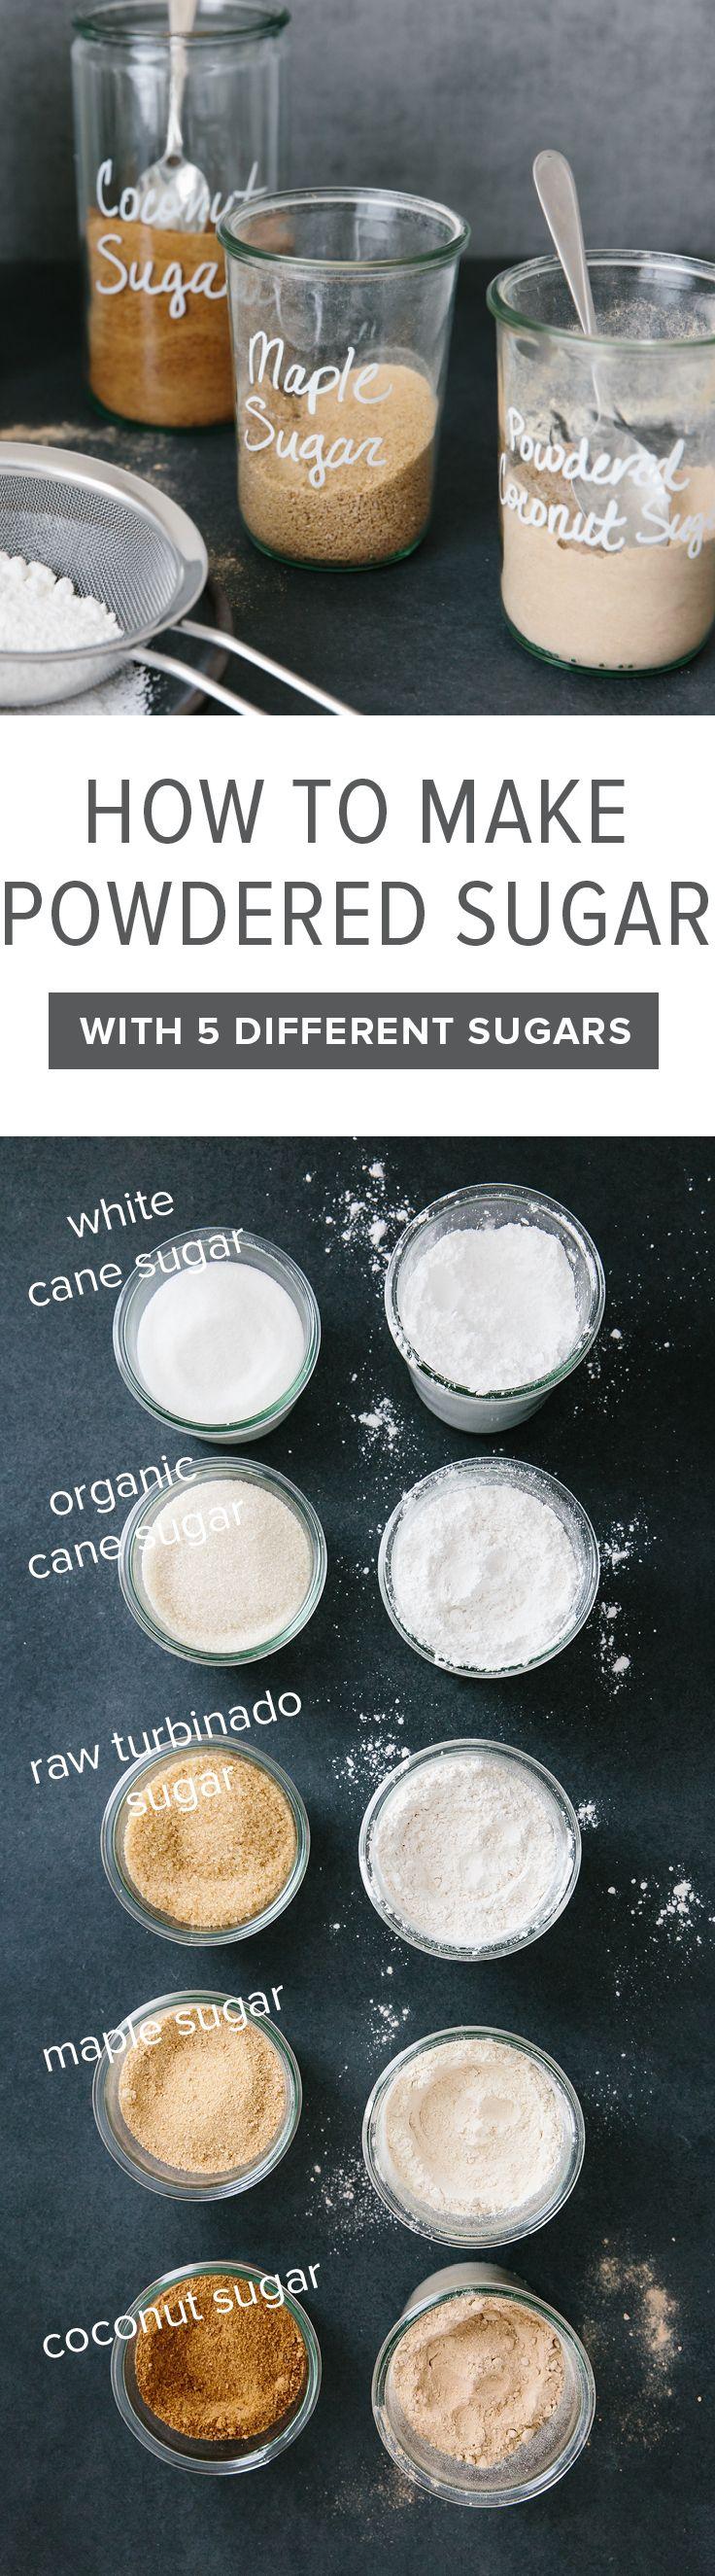 Learn how to make powdered sugar at home, with the sugar of your choice (including cane sugar, raw turbinado sugar, maple sugar or coconut sugar).